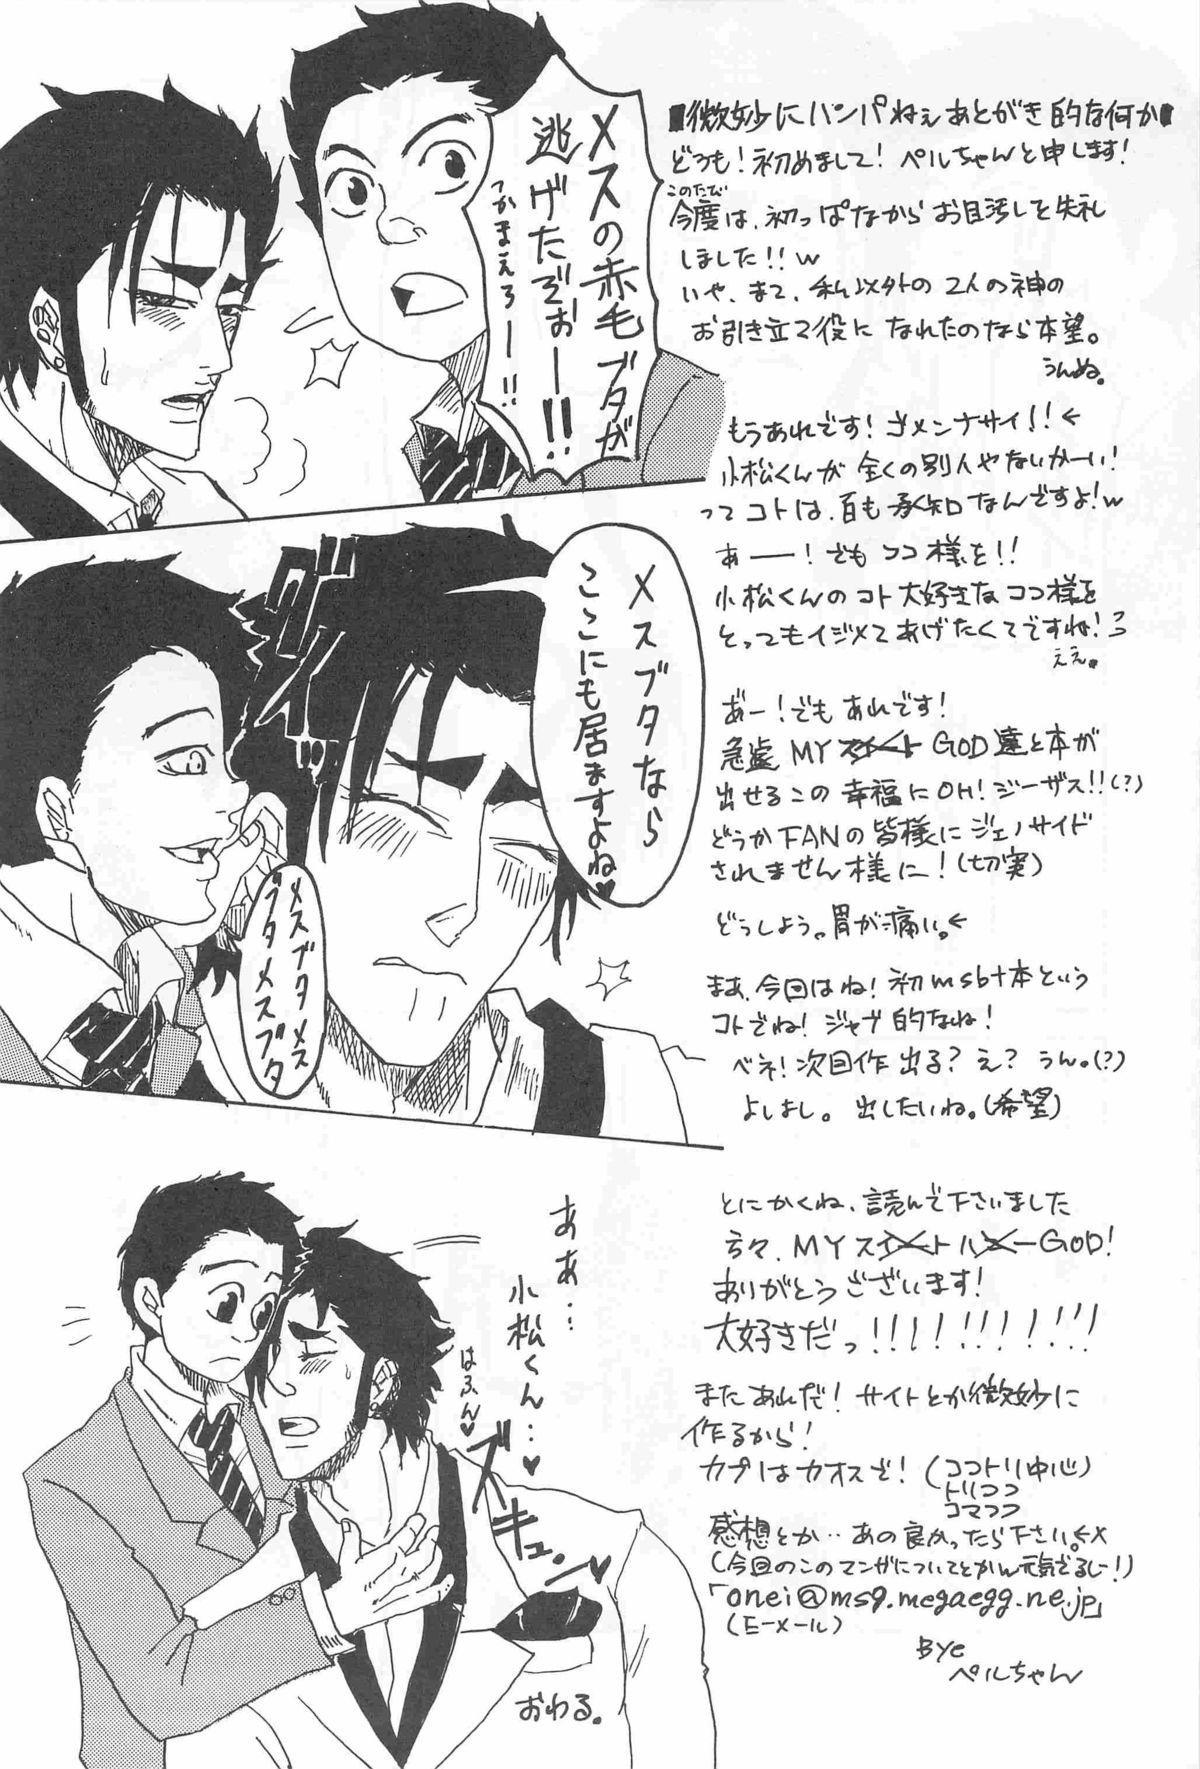 [Kijima Hyougo,Jun'ai Meringue-don,RIN!] [msbt] (Toriko) 15